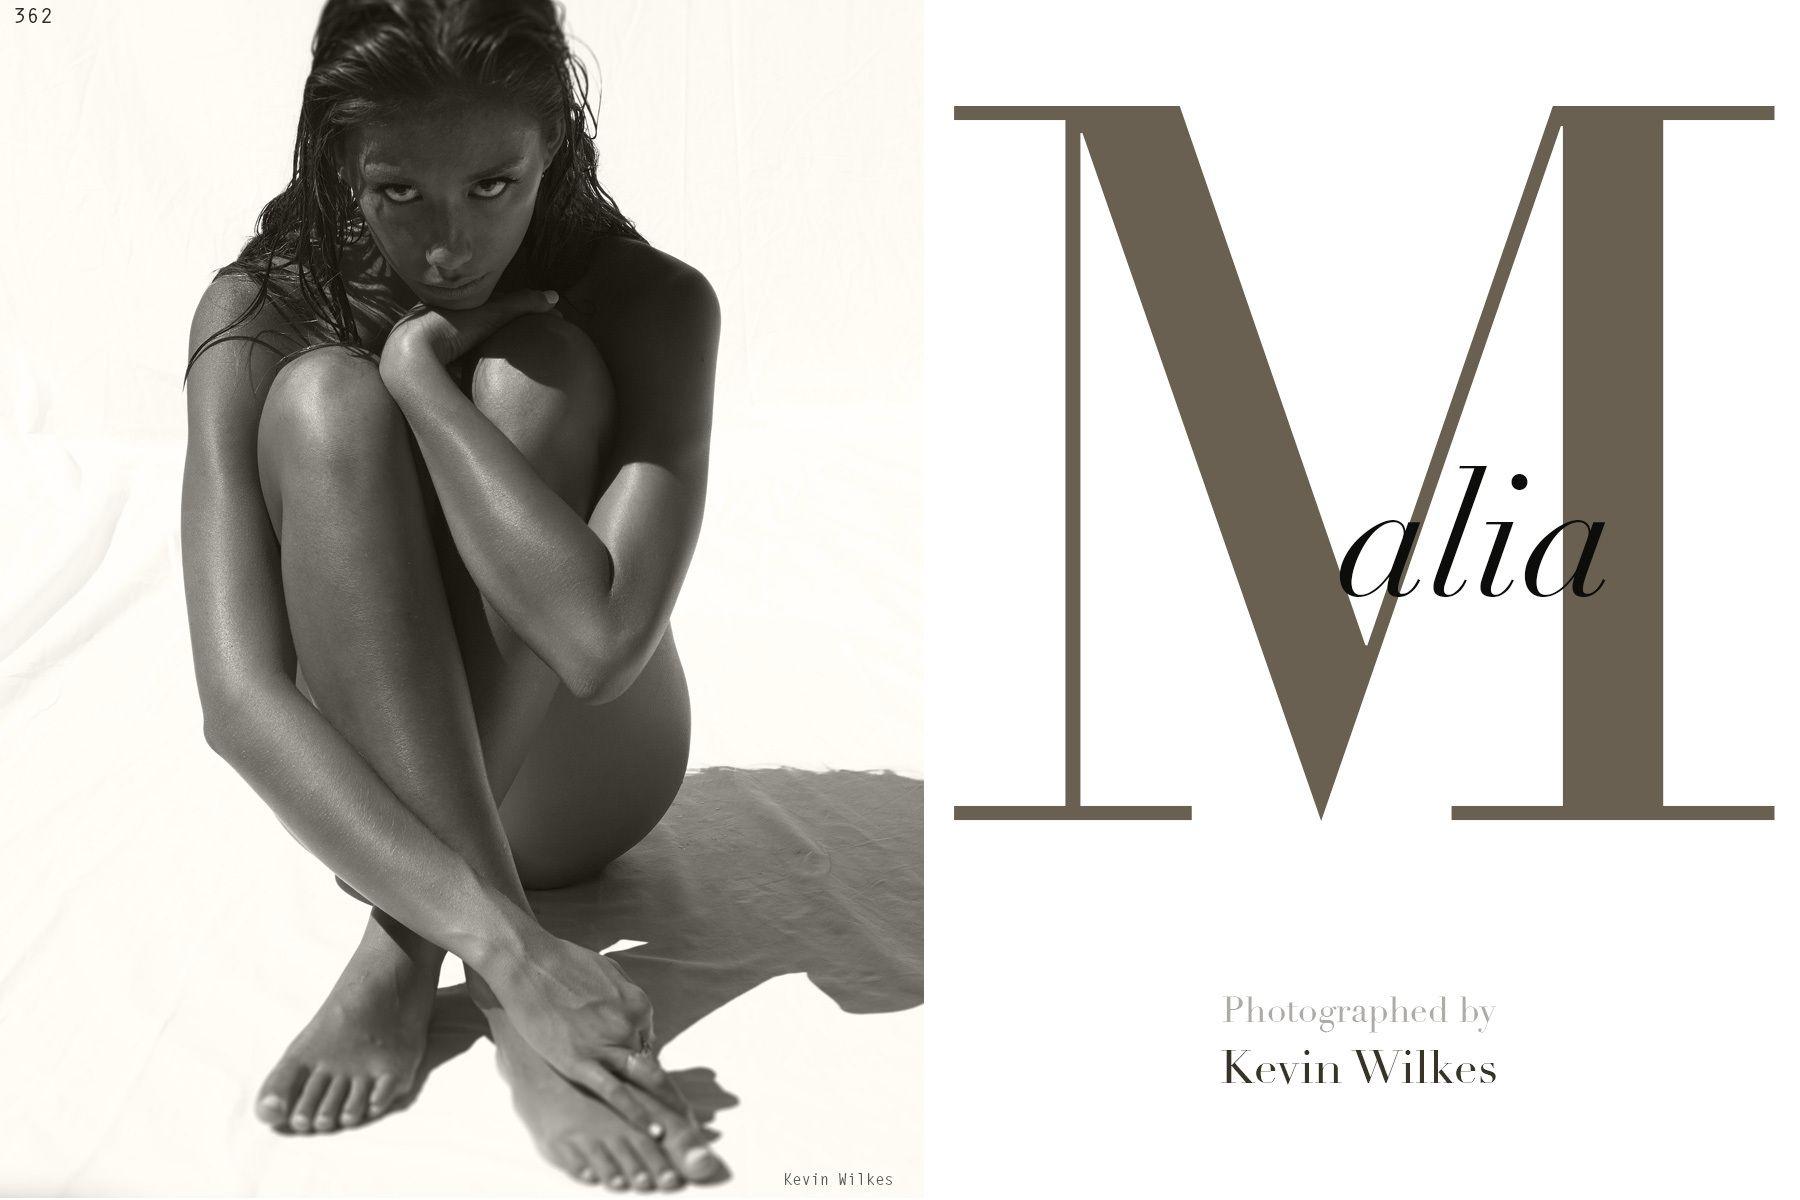 Malia. 362 Magazine. Kevin Wilkes